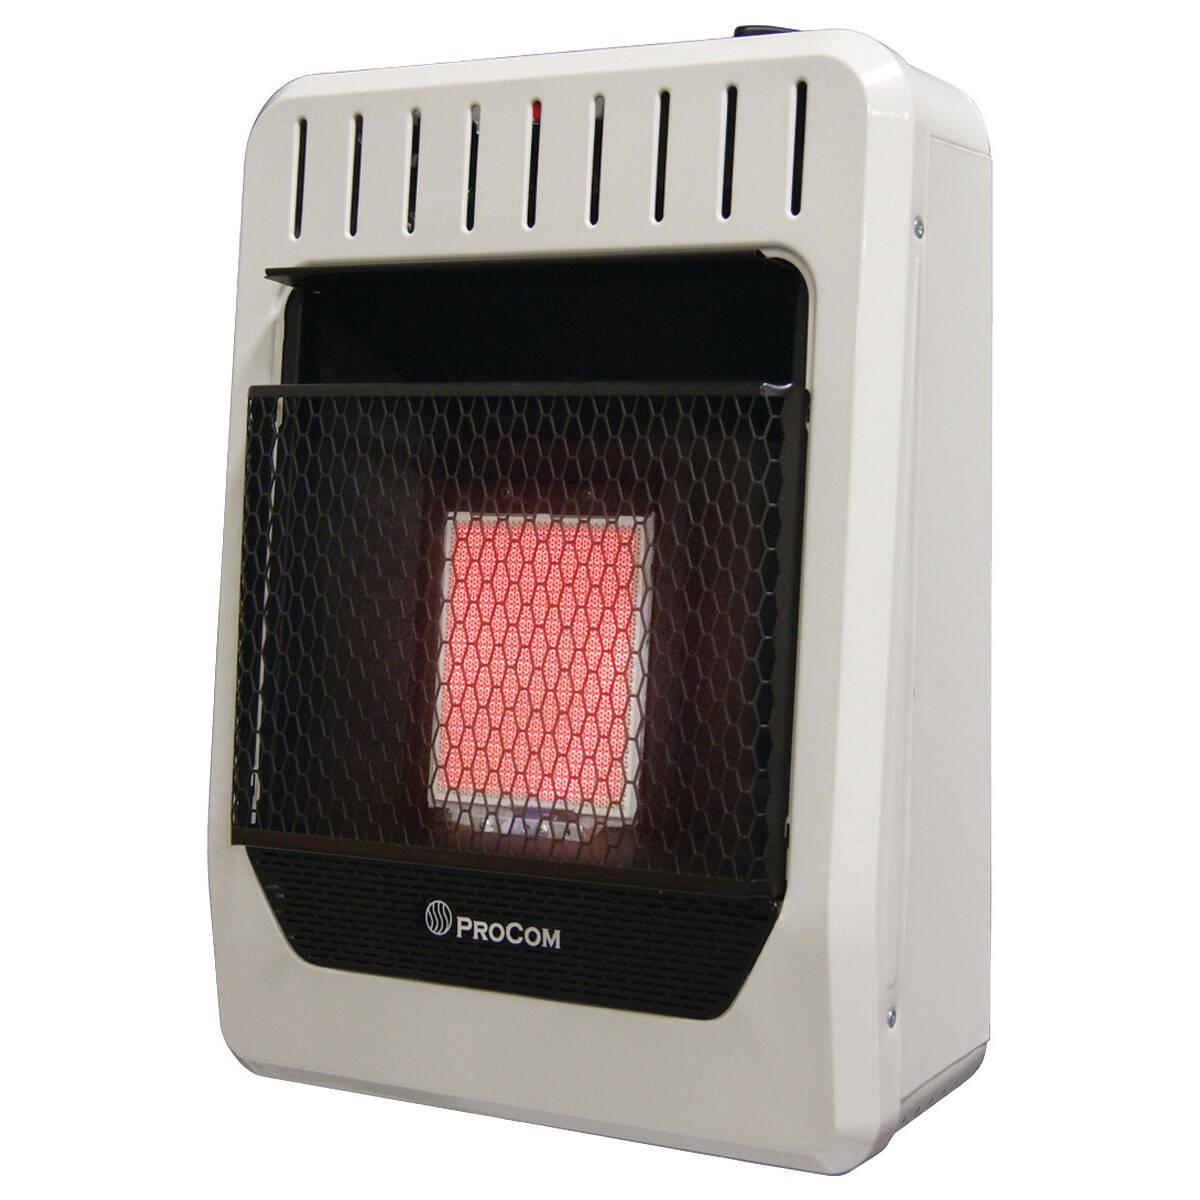 Procom Heating MG1TIR